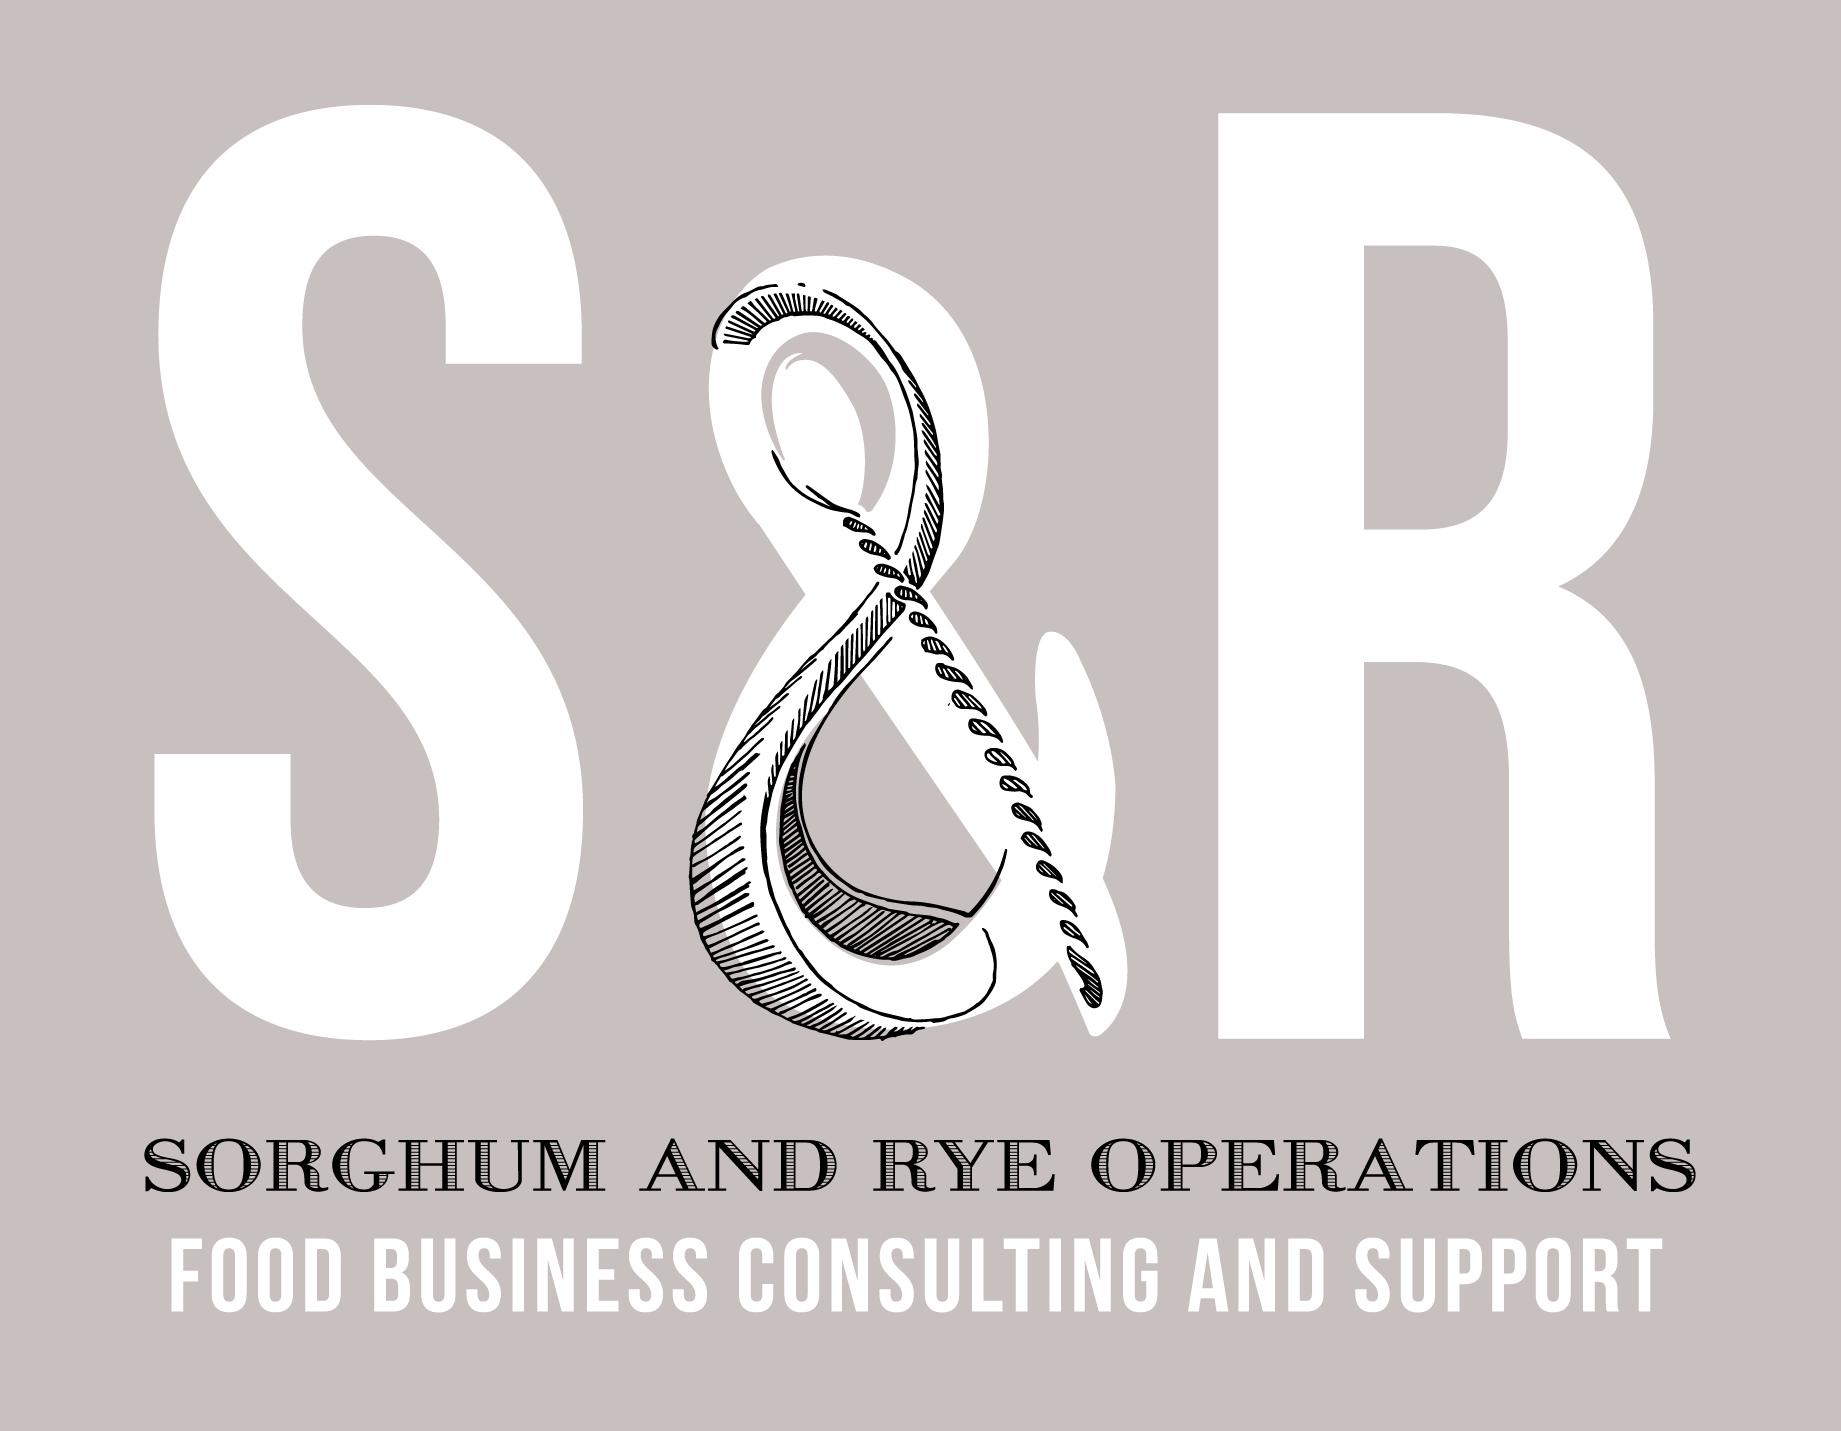 s-r_logo-full-background-01.png